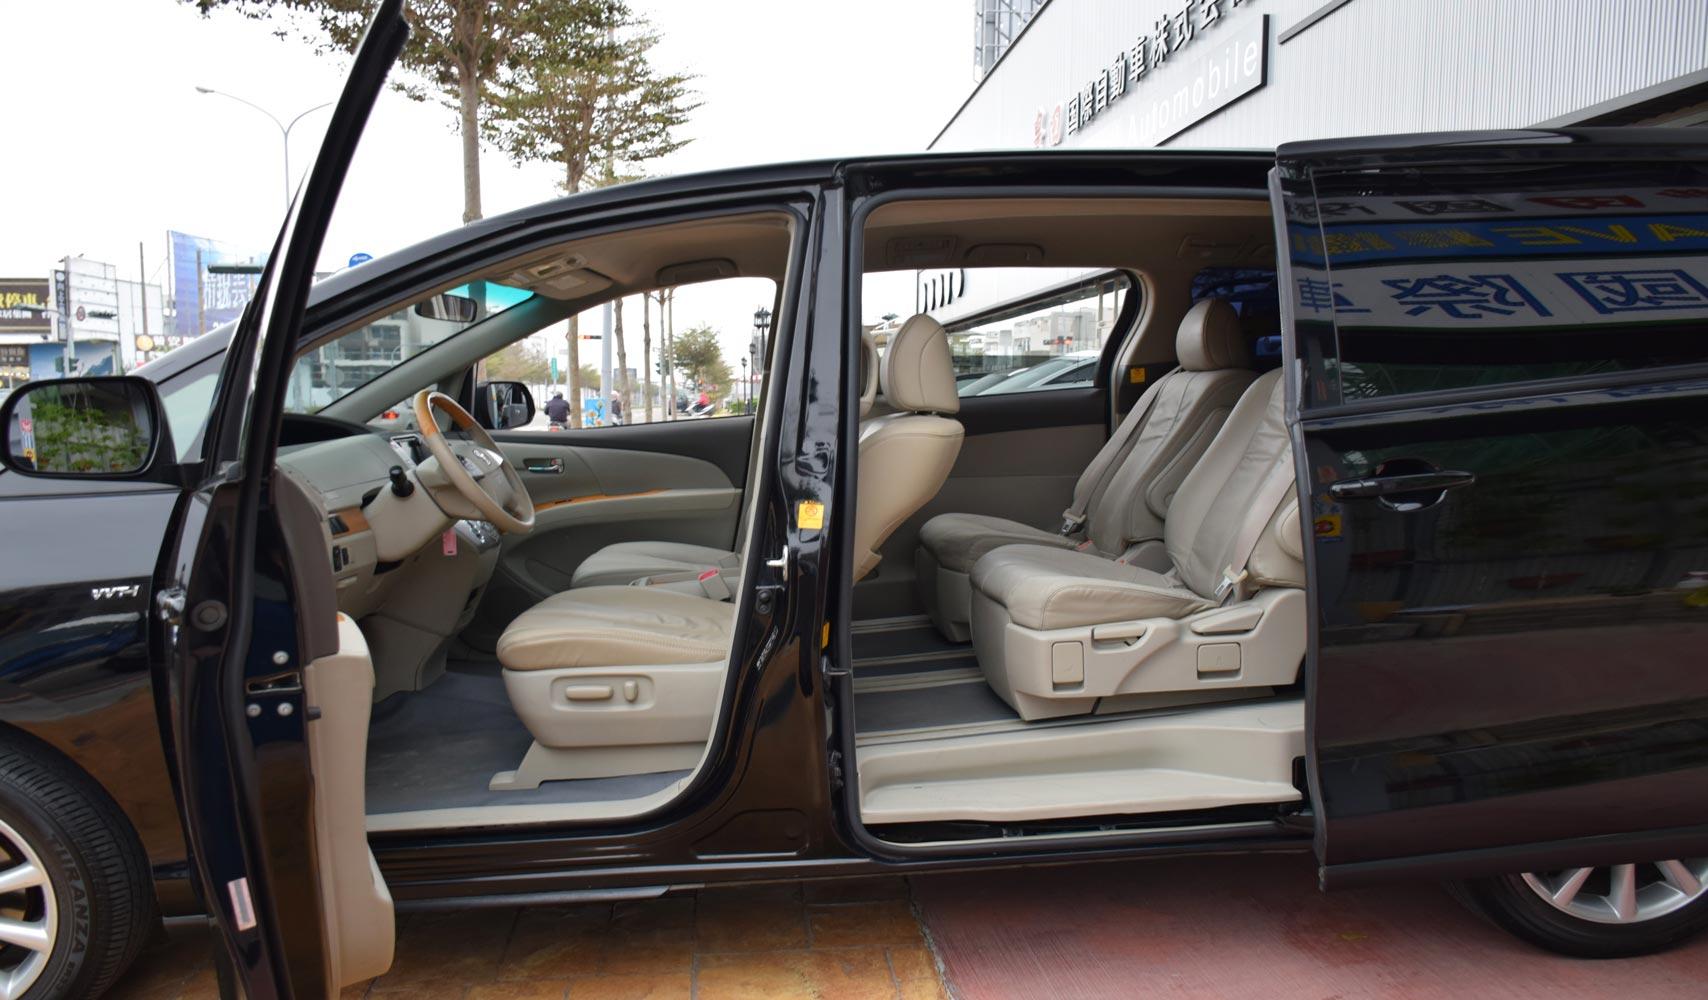 toyota previa-丰田国际车业-在库车辆